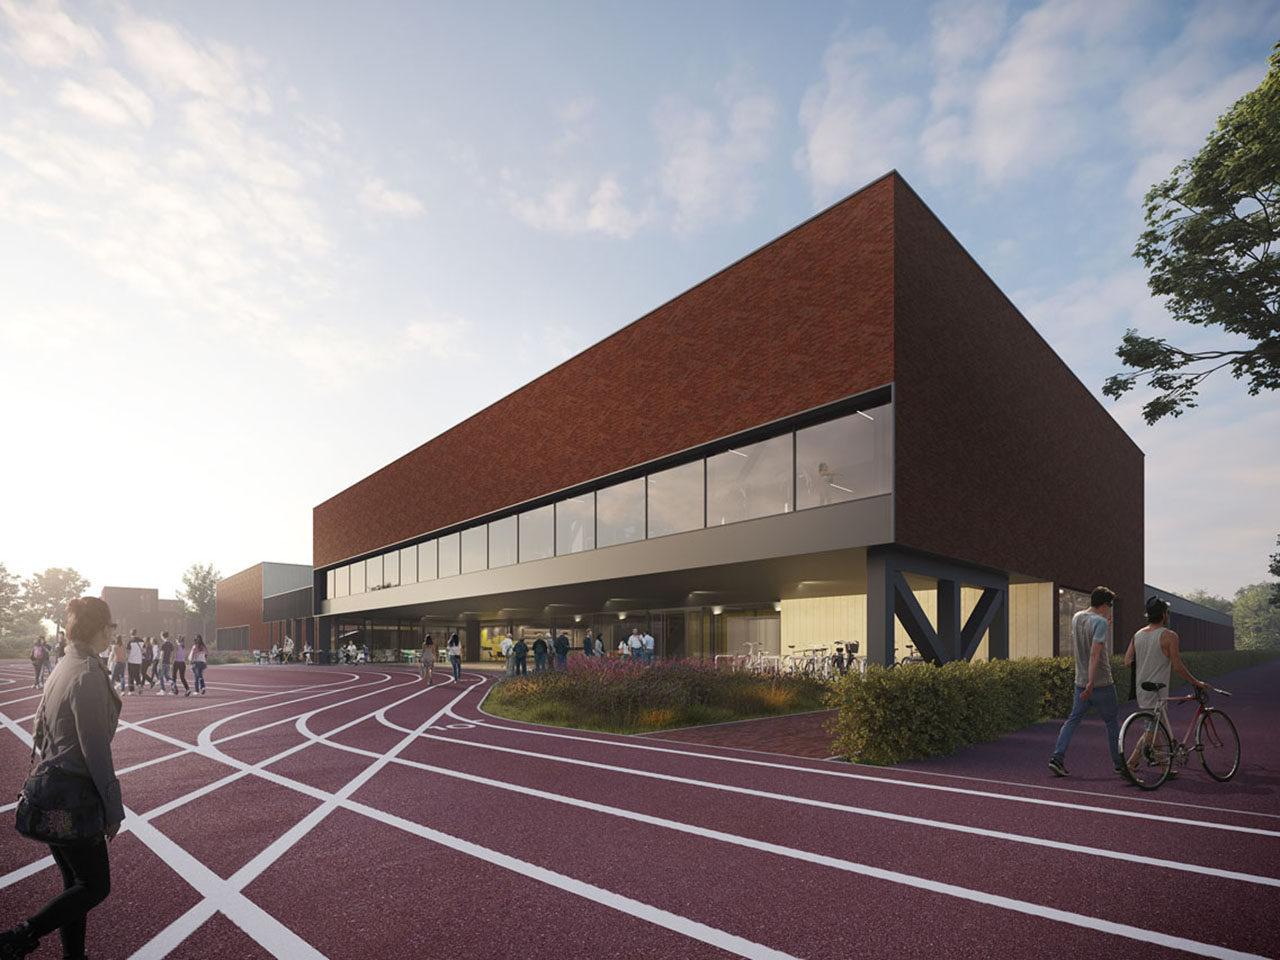 Sportcomplex Hellevoetsluis